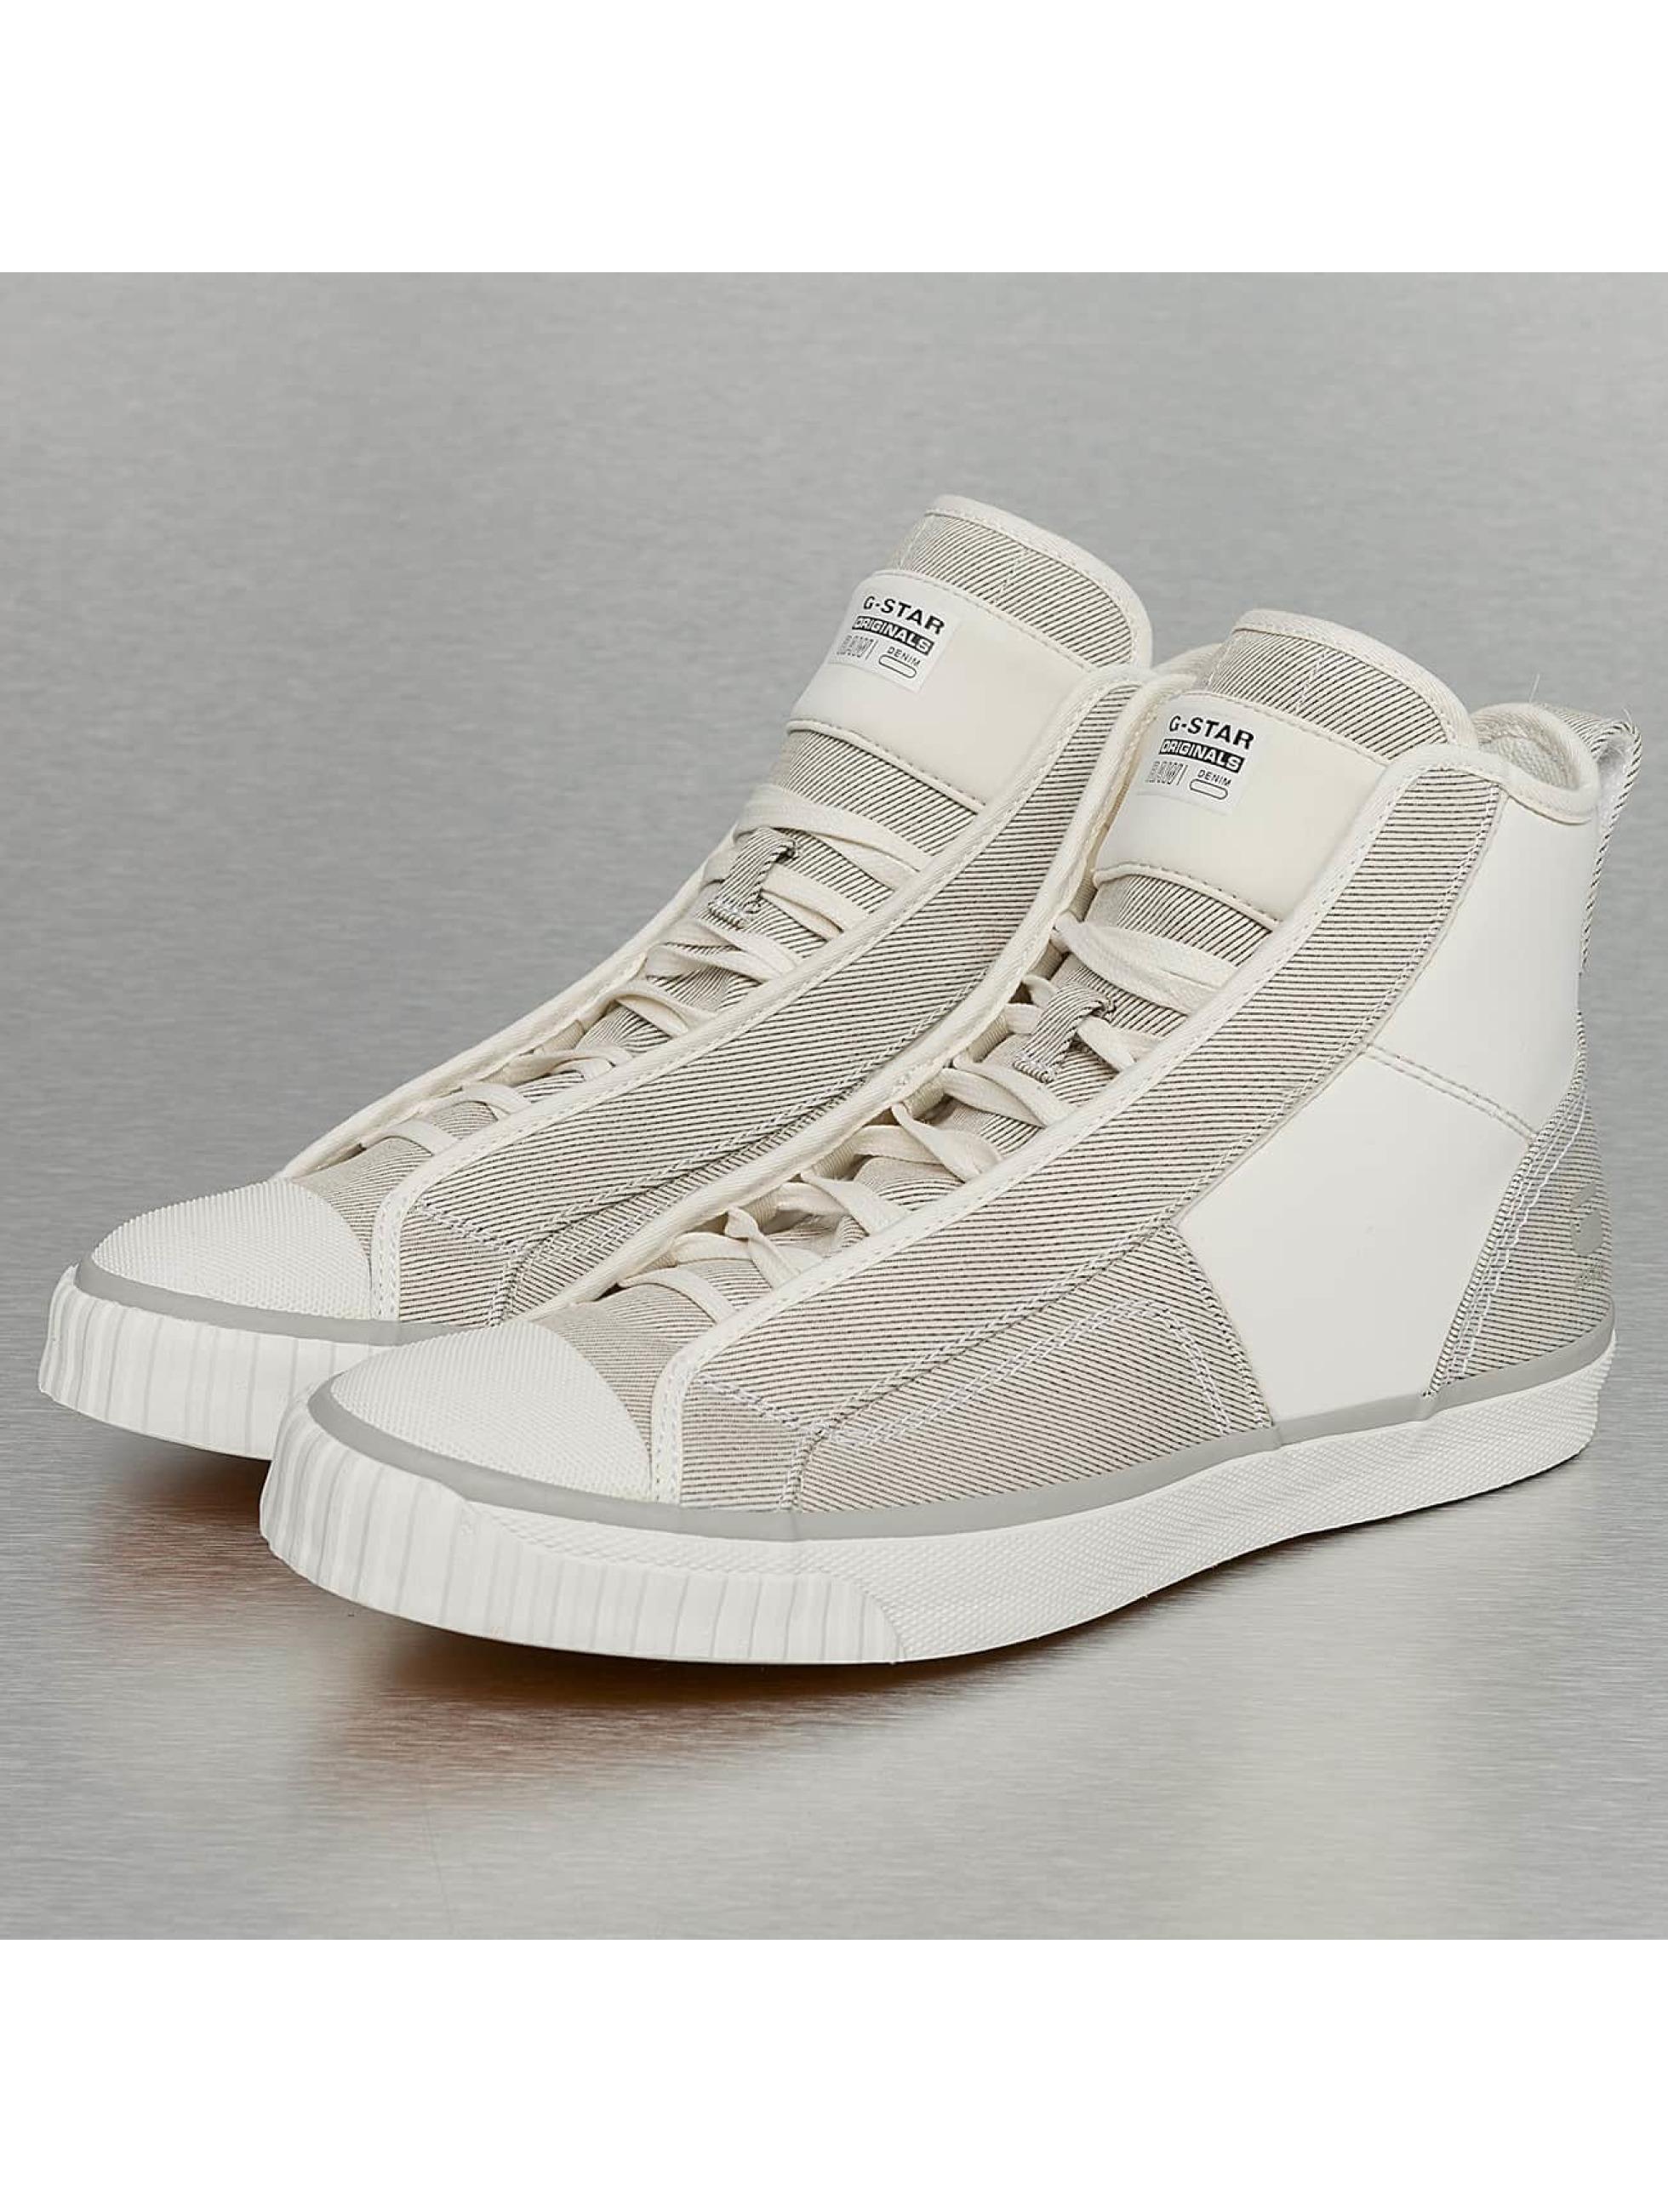 G-Star Footwear Сникеры Scuba белый